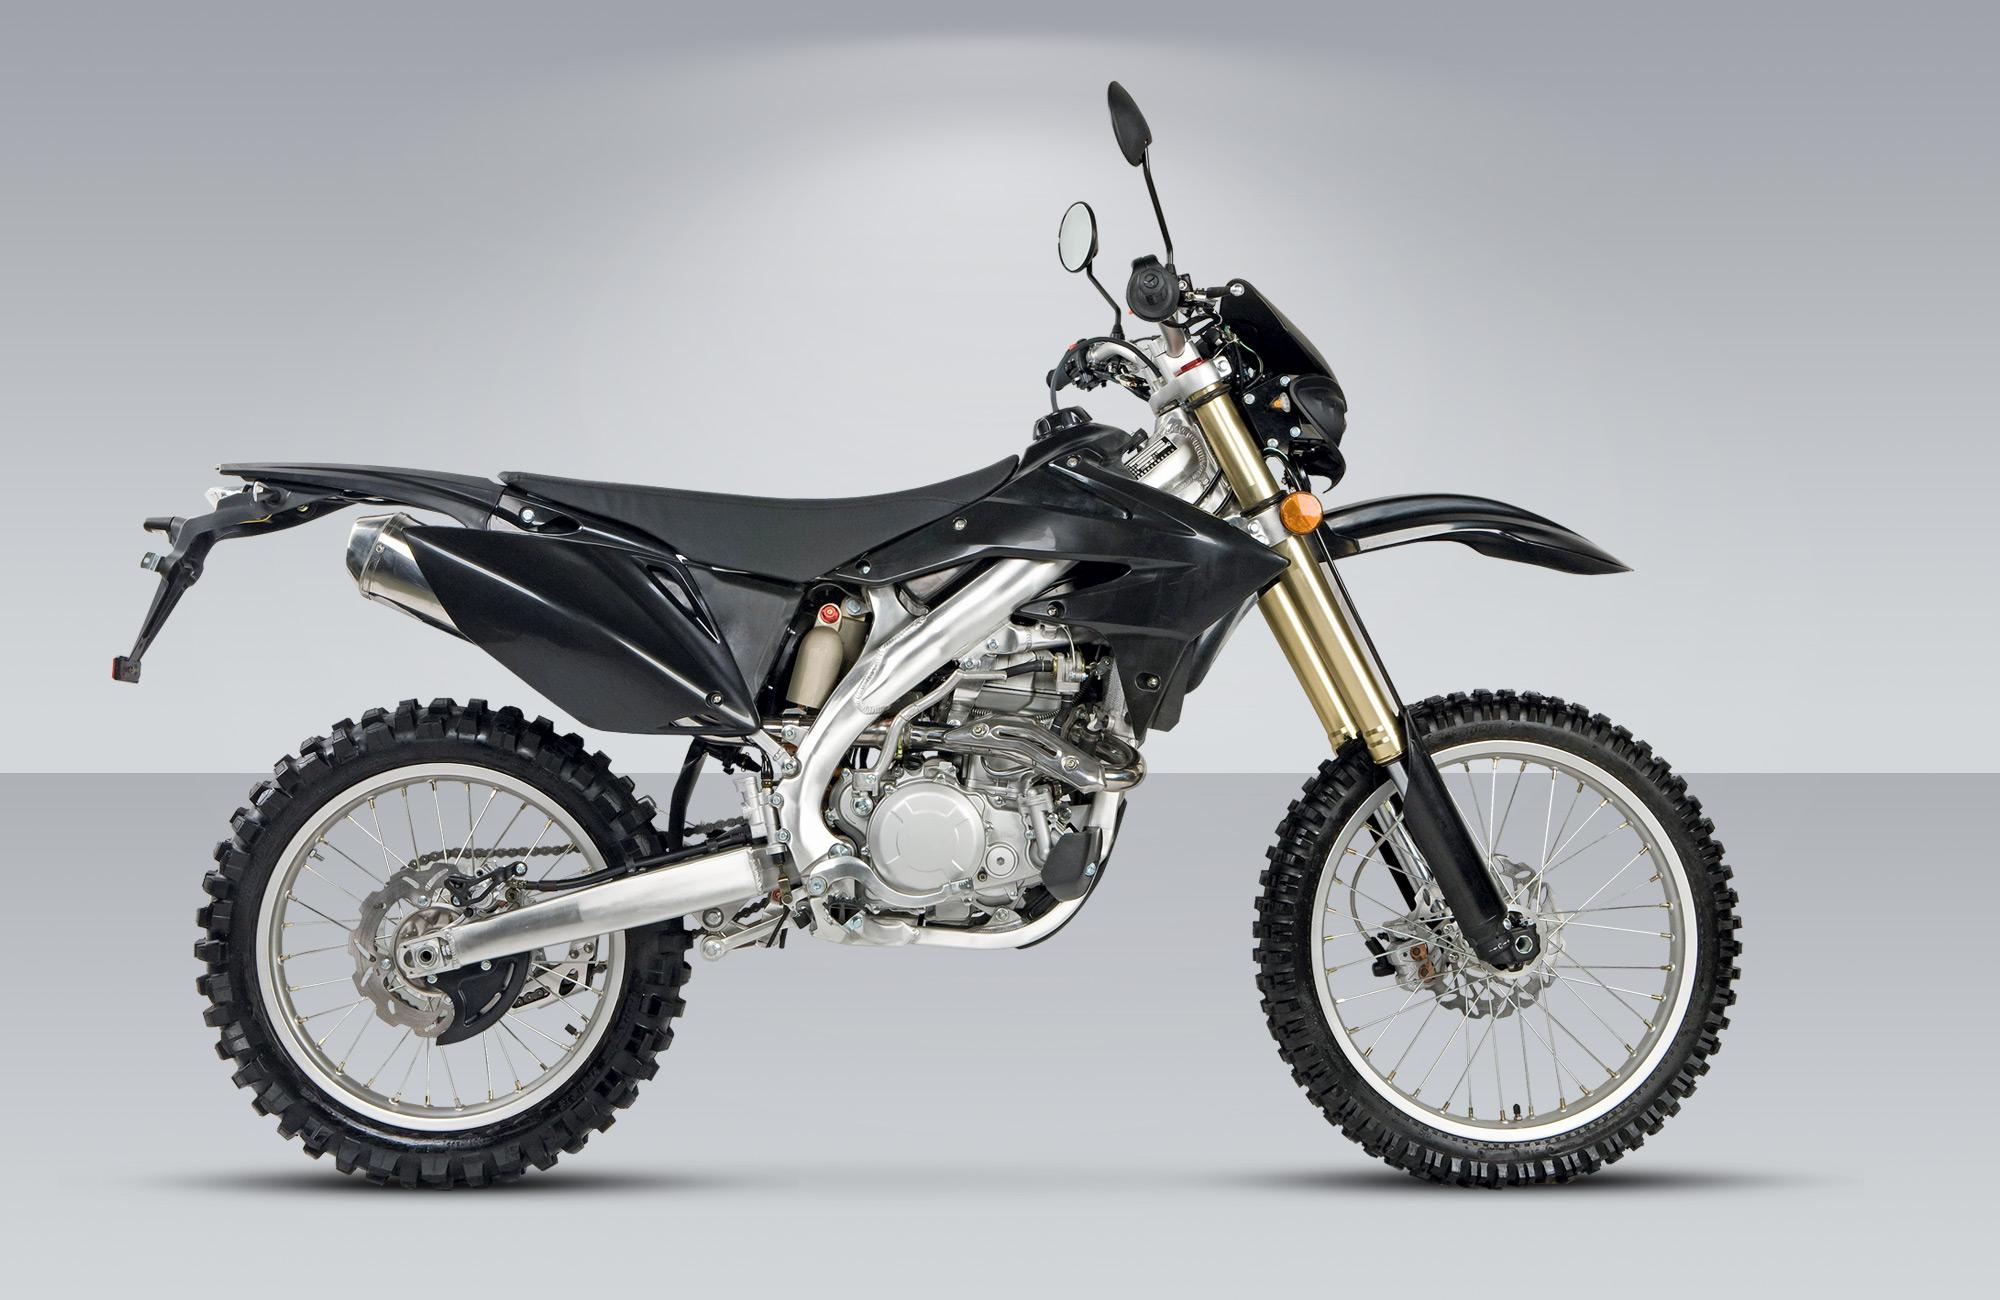 Продается мотоцикл STELS ENDURO 450